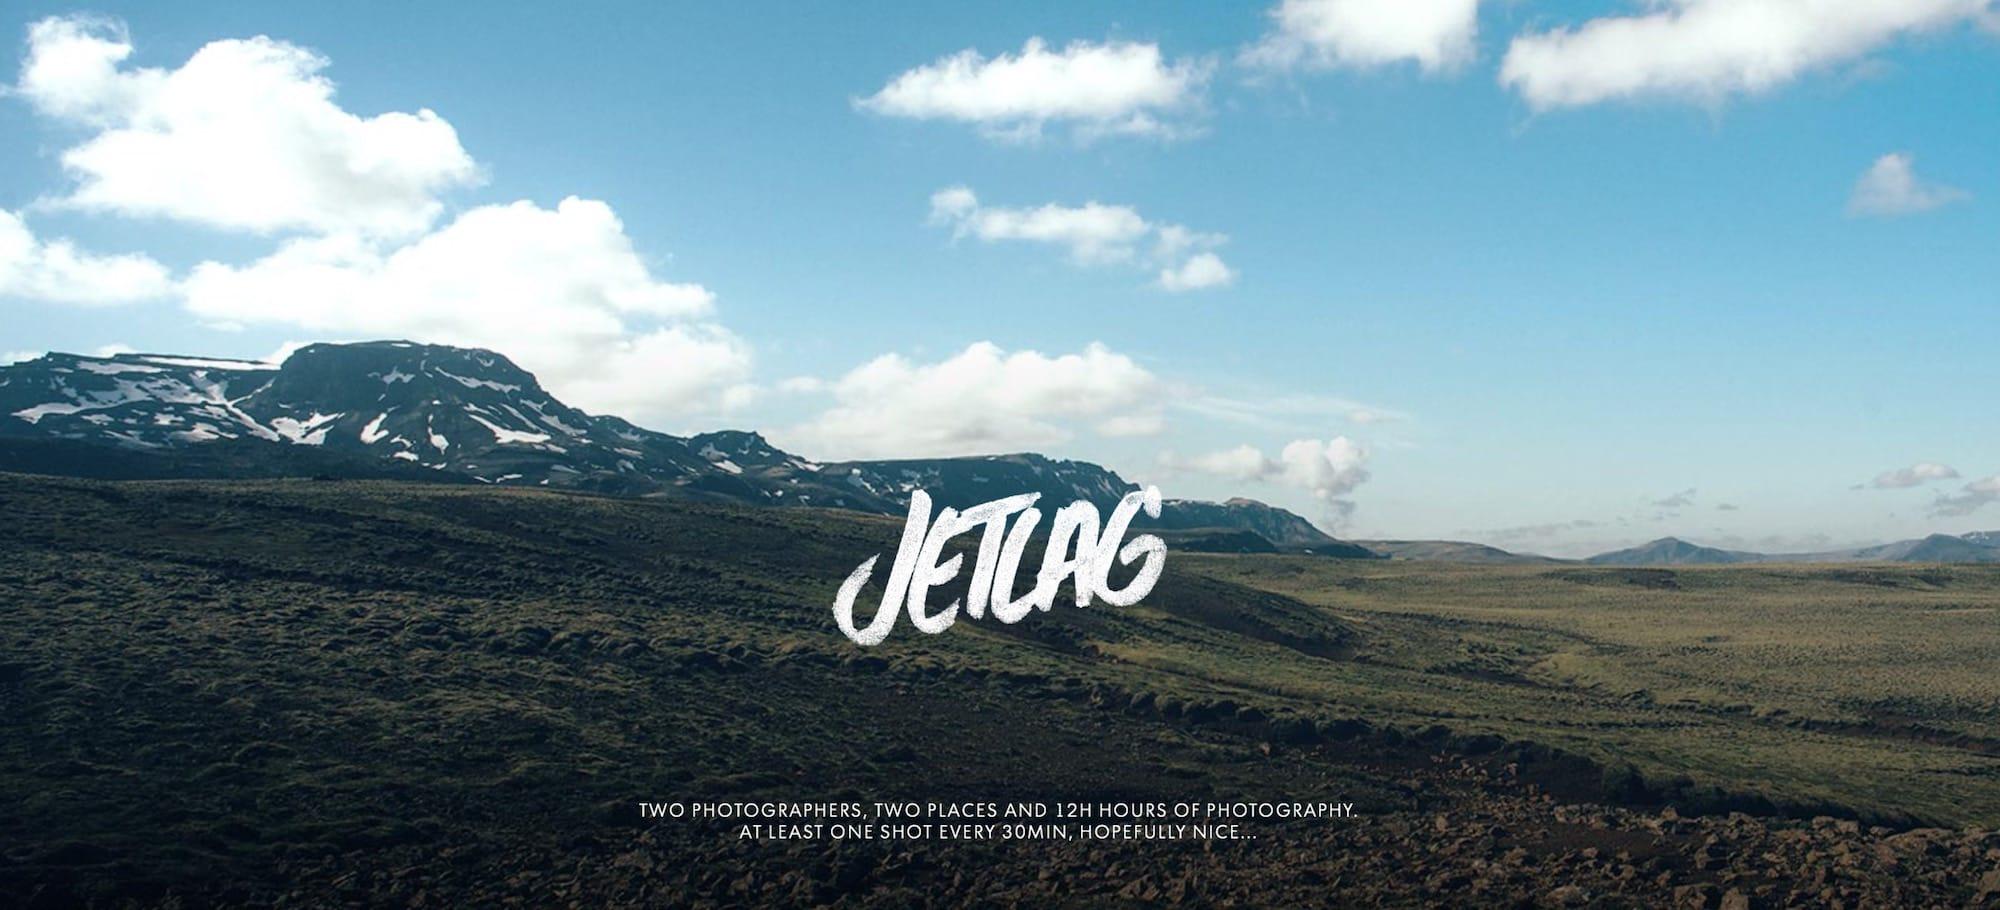 Jetlag-photography-hero-hero